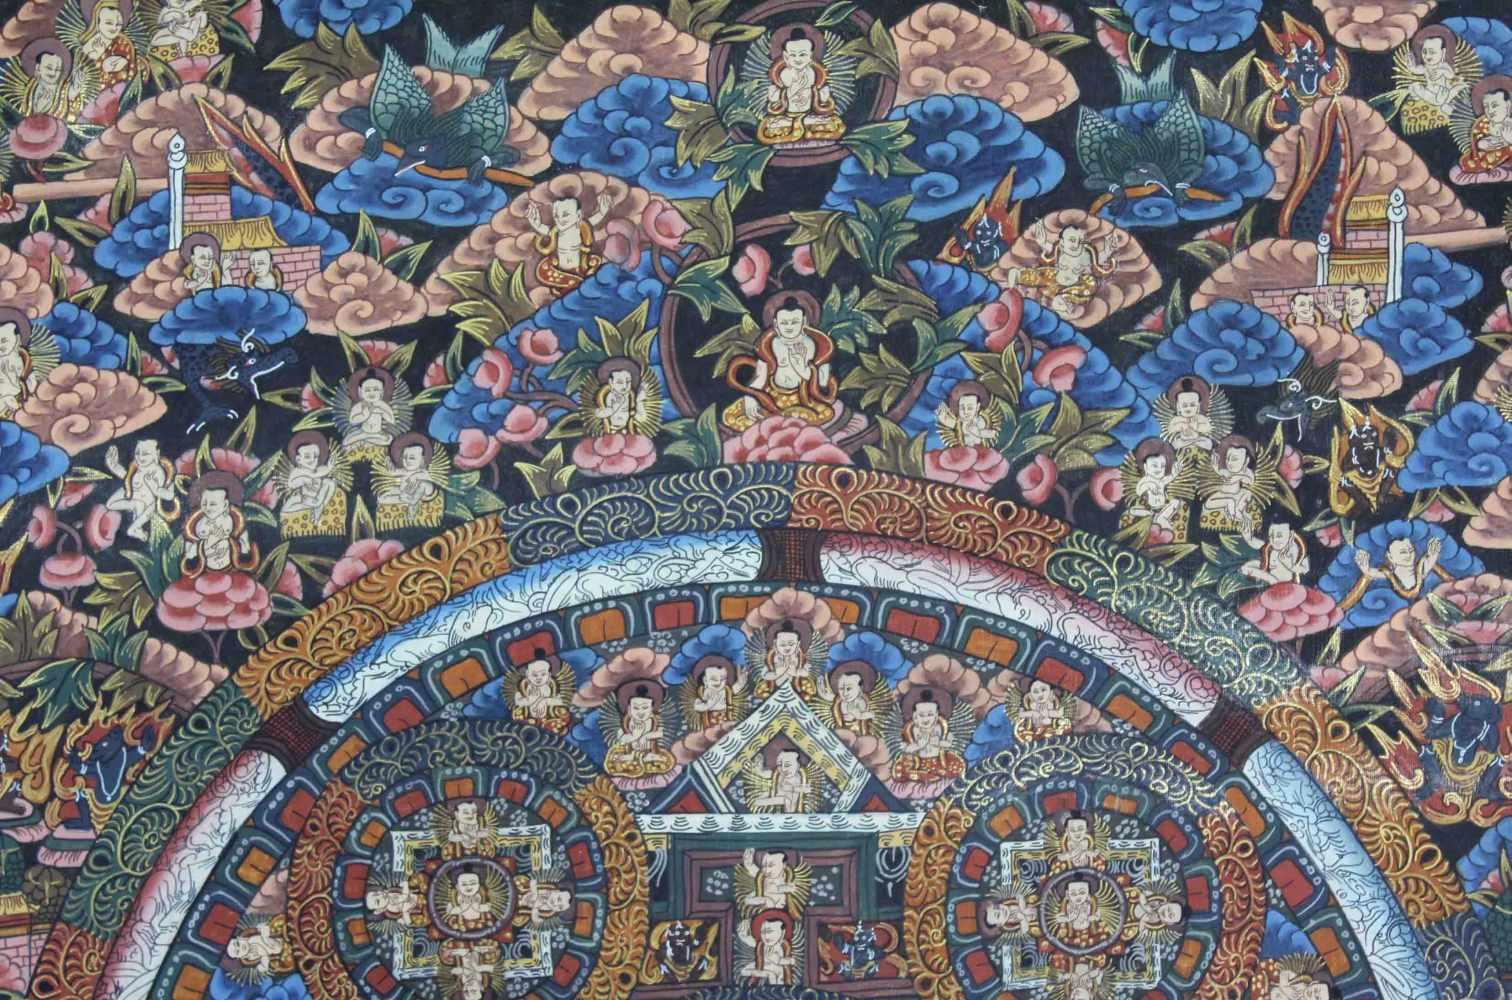 Lot 18 - Kalachakra Mandala, China / Tibet alt.55 cm x 39,5 cm. Gemälde. 5 fach Mandala? Lebensrad?Kalachakra